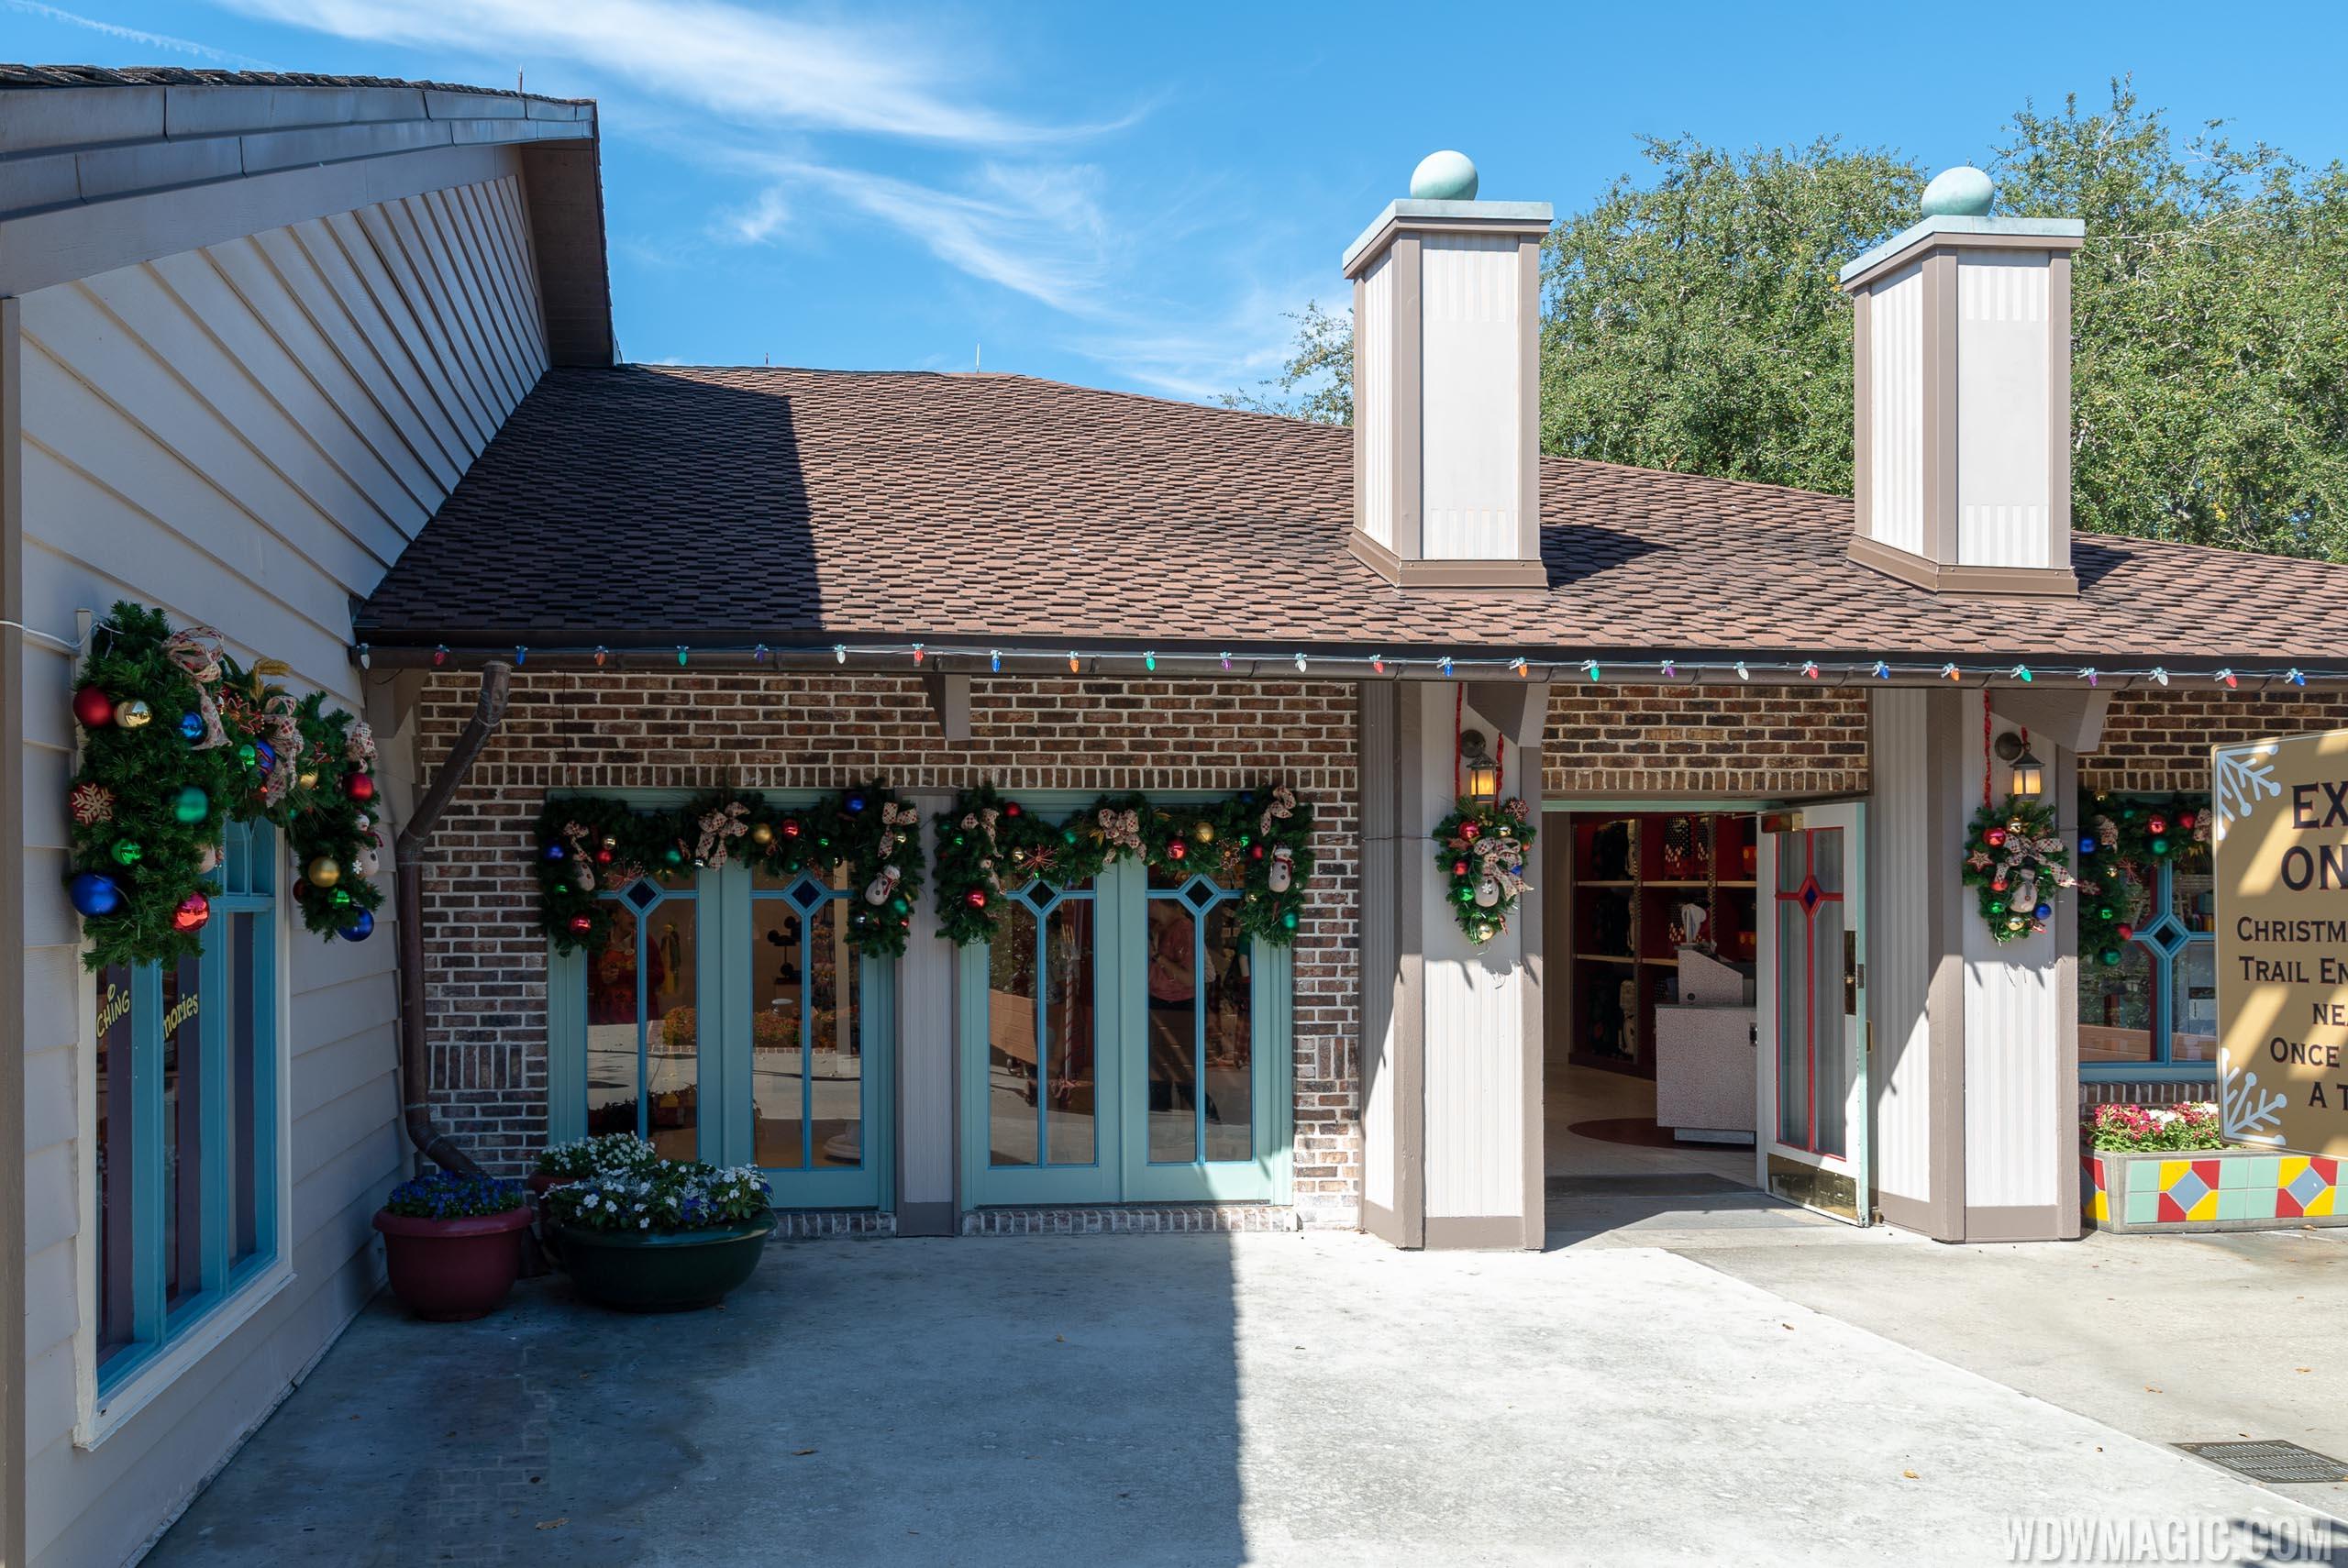 Disney's Wonderful World of Memories expands at Disney Springs